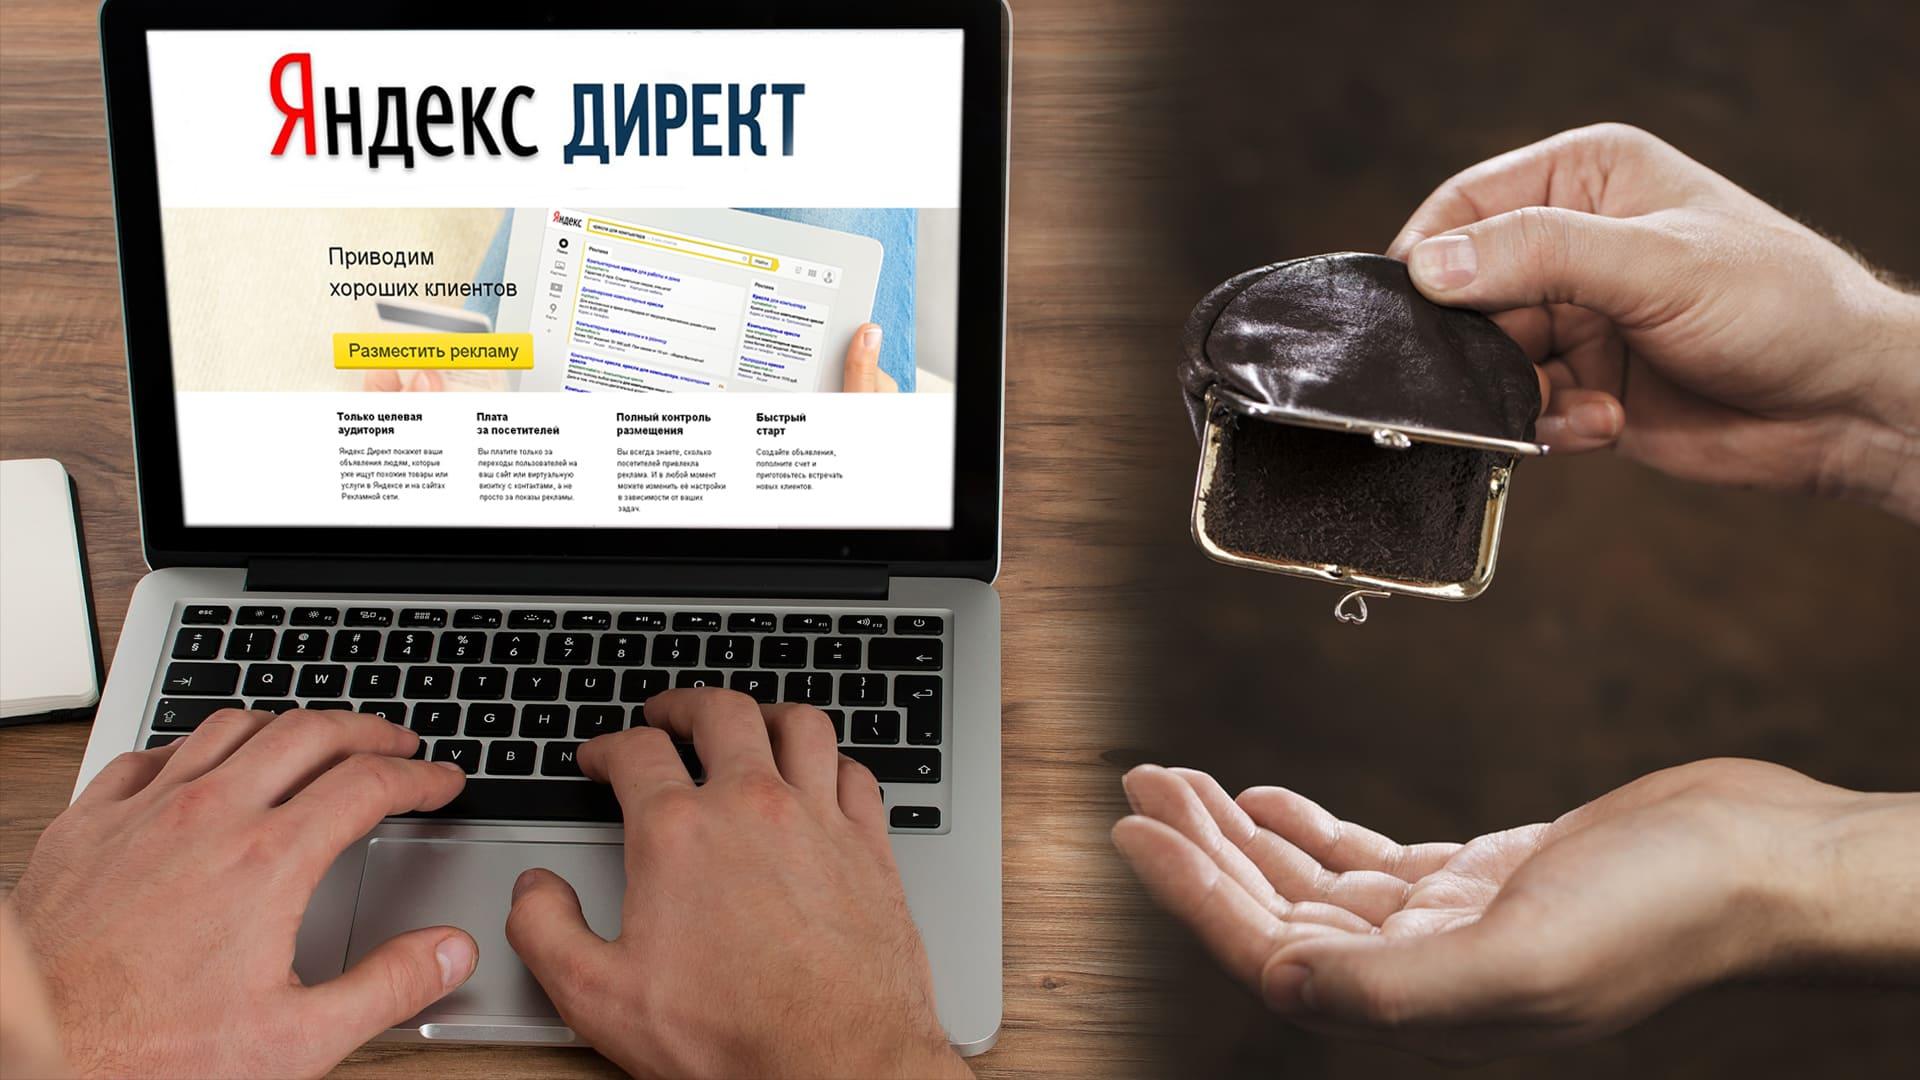 Прогноз бюджета Яндекс